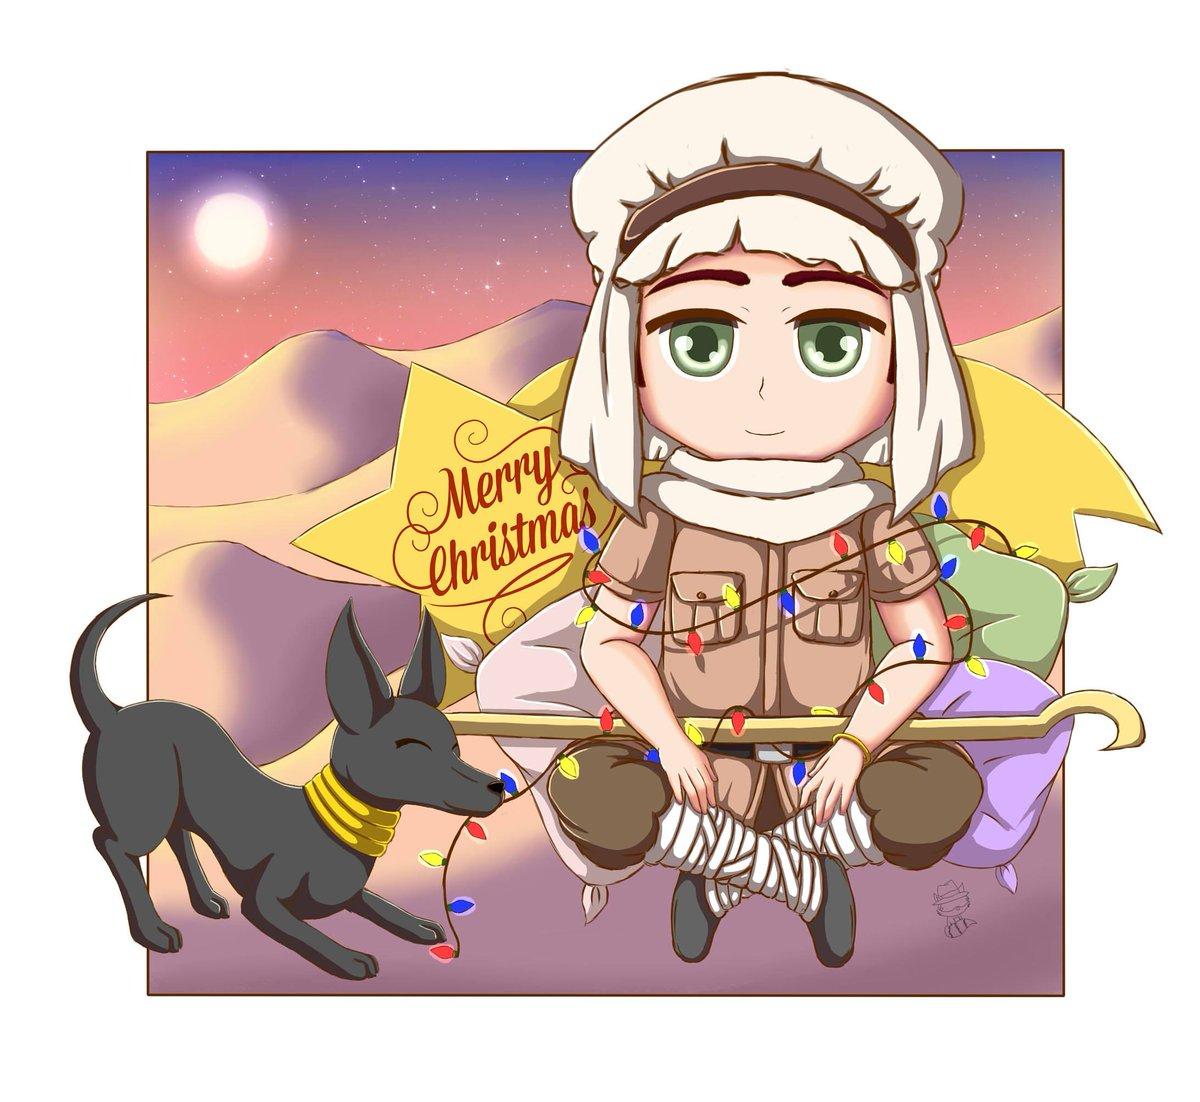 Commission Egipt of Hetalia. . . #Hetalia #Egypt #Egipto #desert #merryxmas #merrychristmas #dog #anubis #star #fanart #picture #chibi #ilustration #aph #photooftheday #art #anime #lights